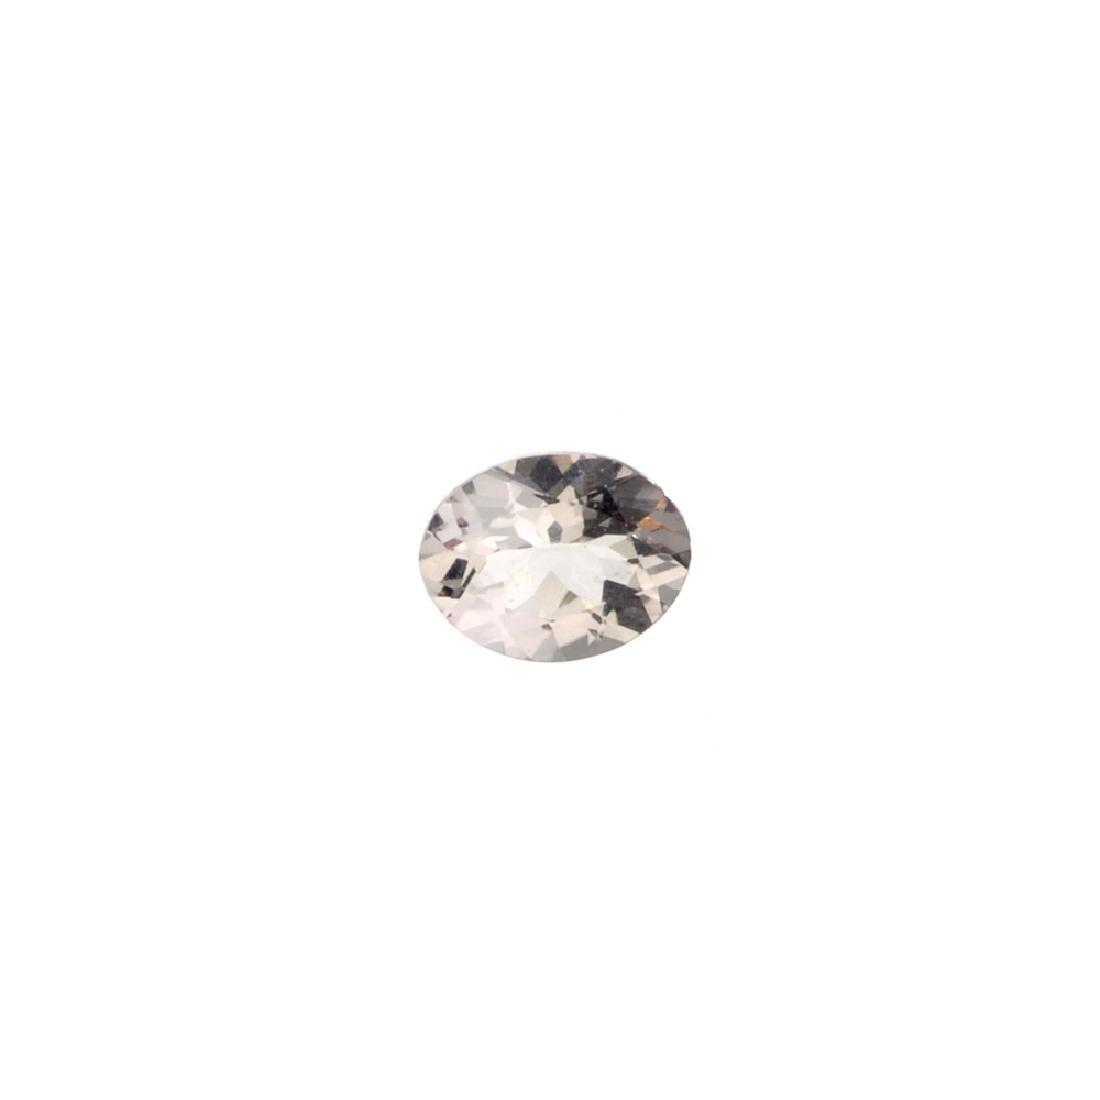 APP: 1.2k 1.74CT Oval Cut Morganite Gemstone